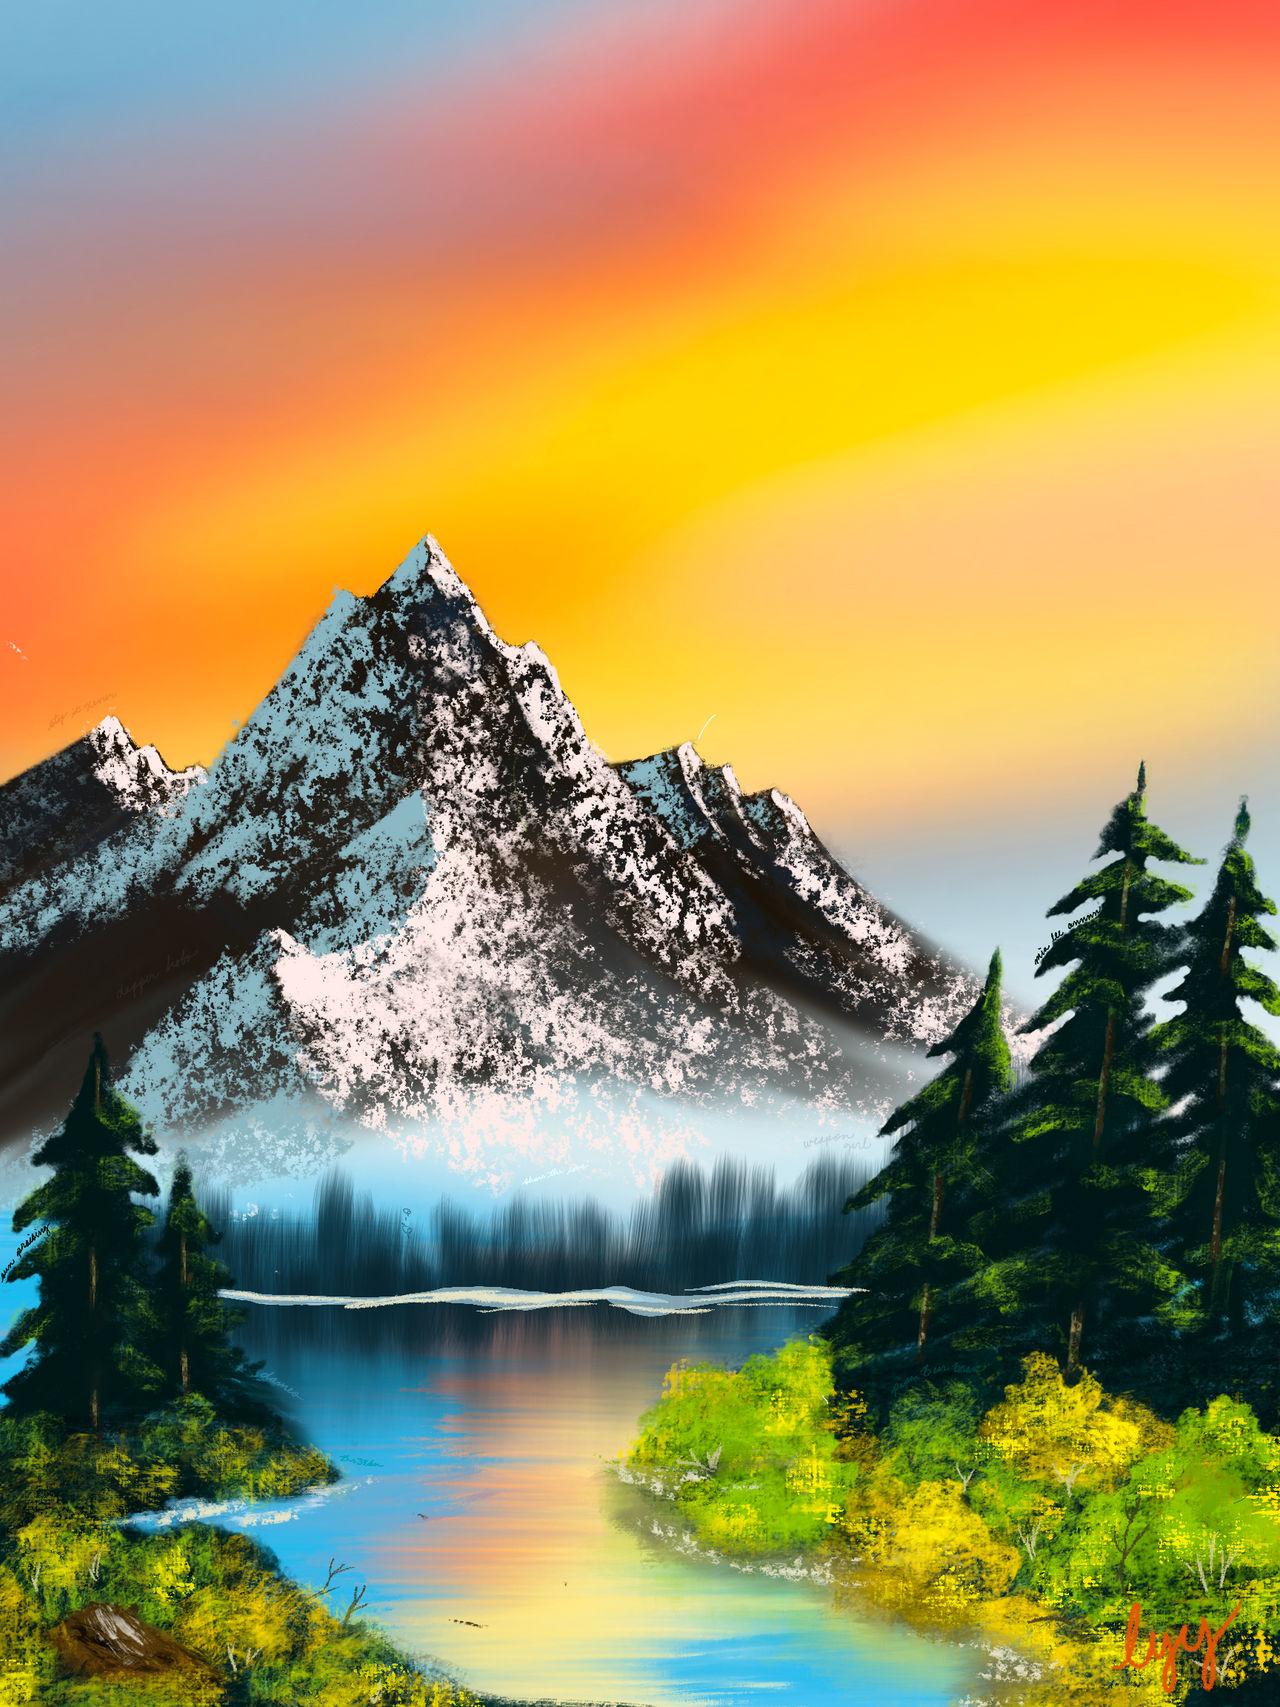 Digital Bob Ross: Peaceful Reflections (S15 Ep.4)